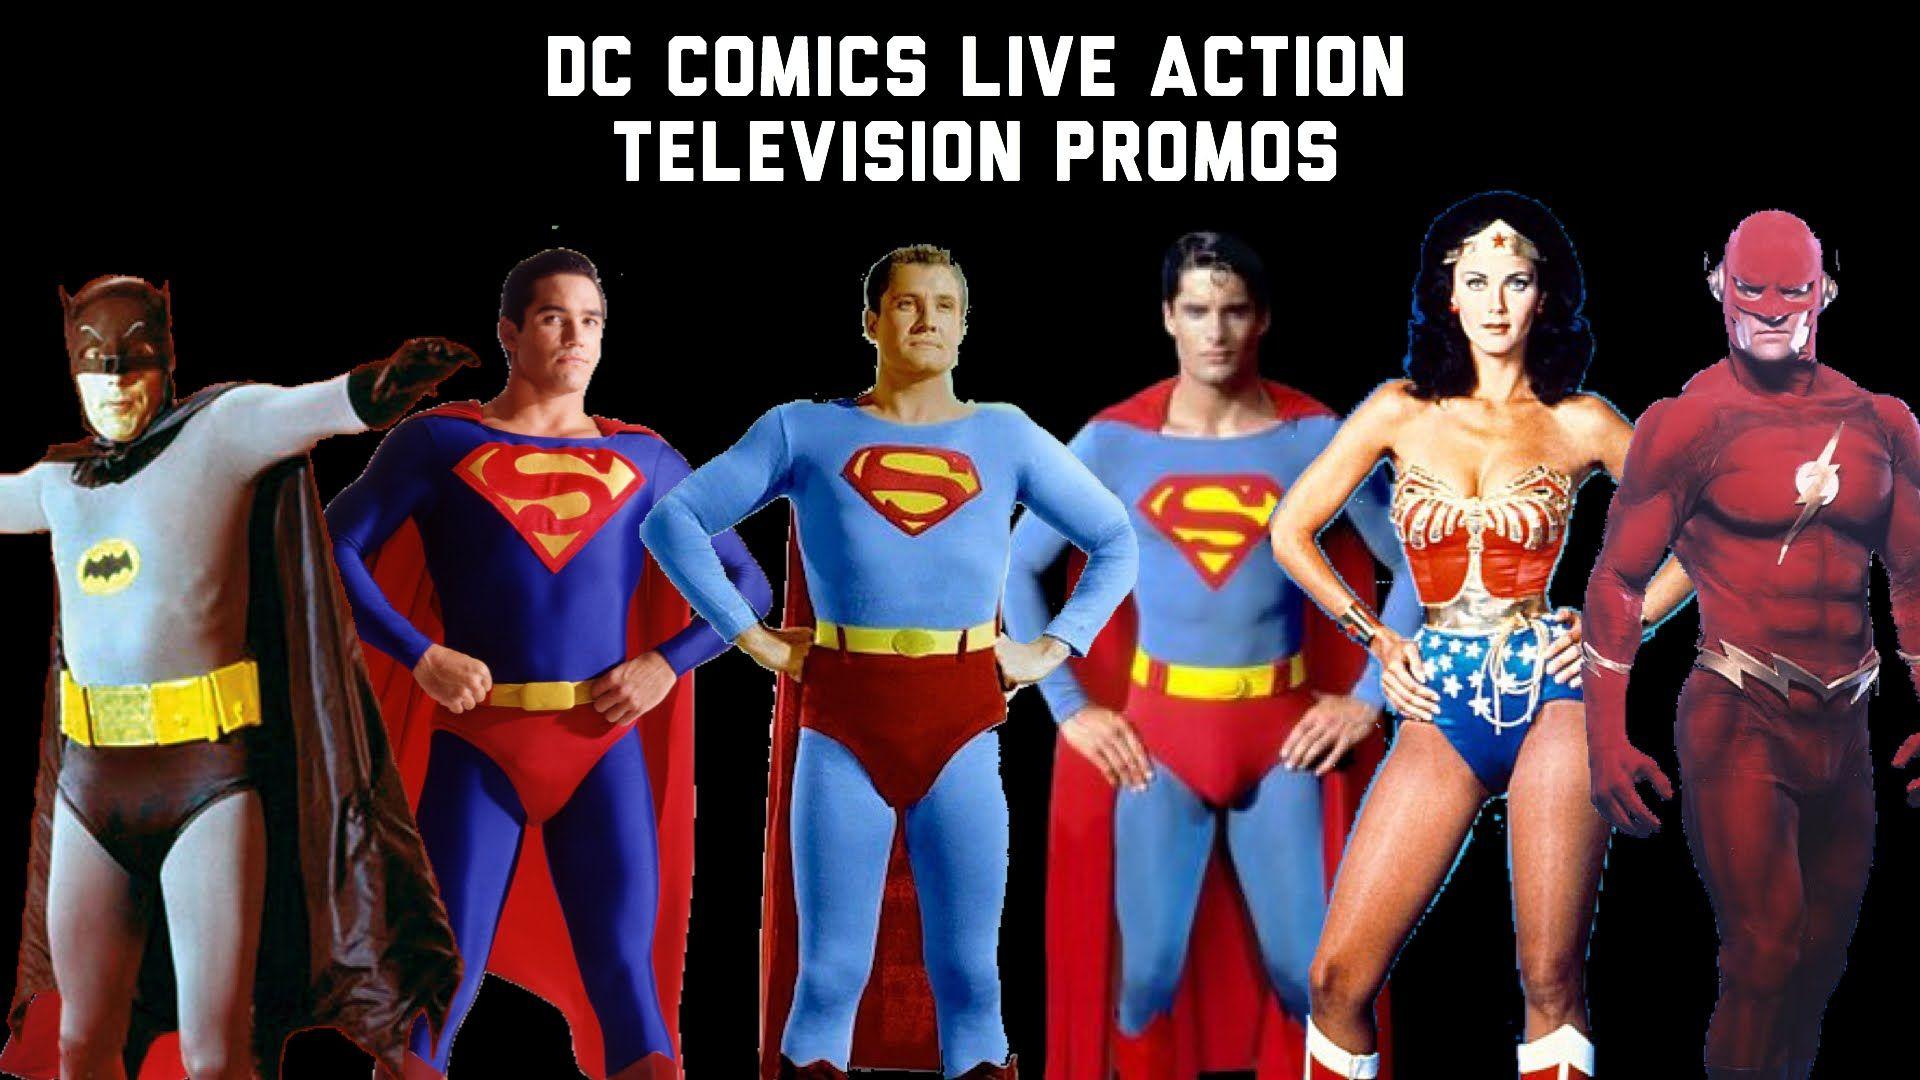 DC Comics Live Action Television Promos